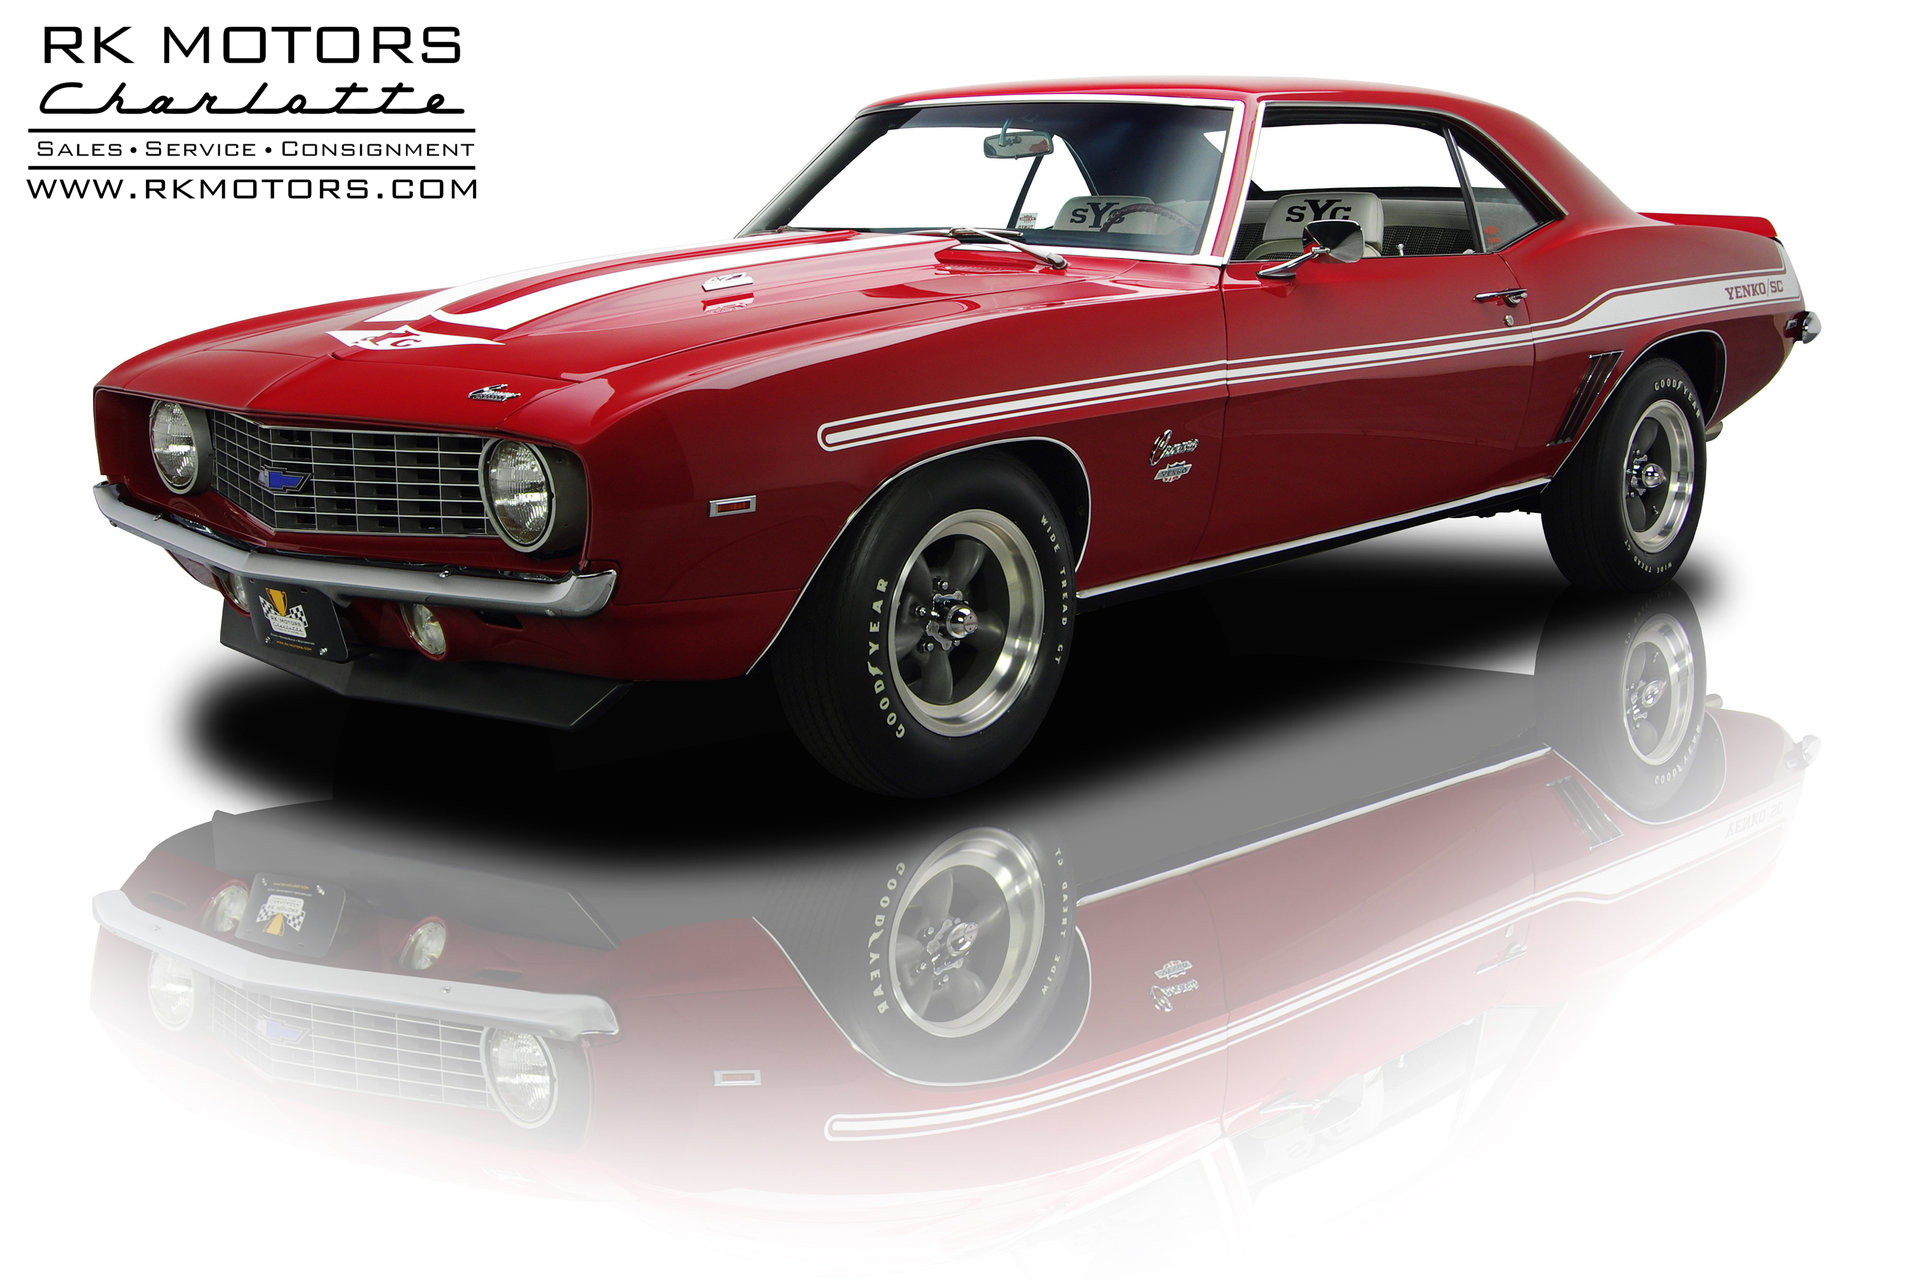 132787 1969 Chevrolet Camaro Rk Motors Classic And Performance 1968 Yenko For Sale